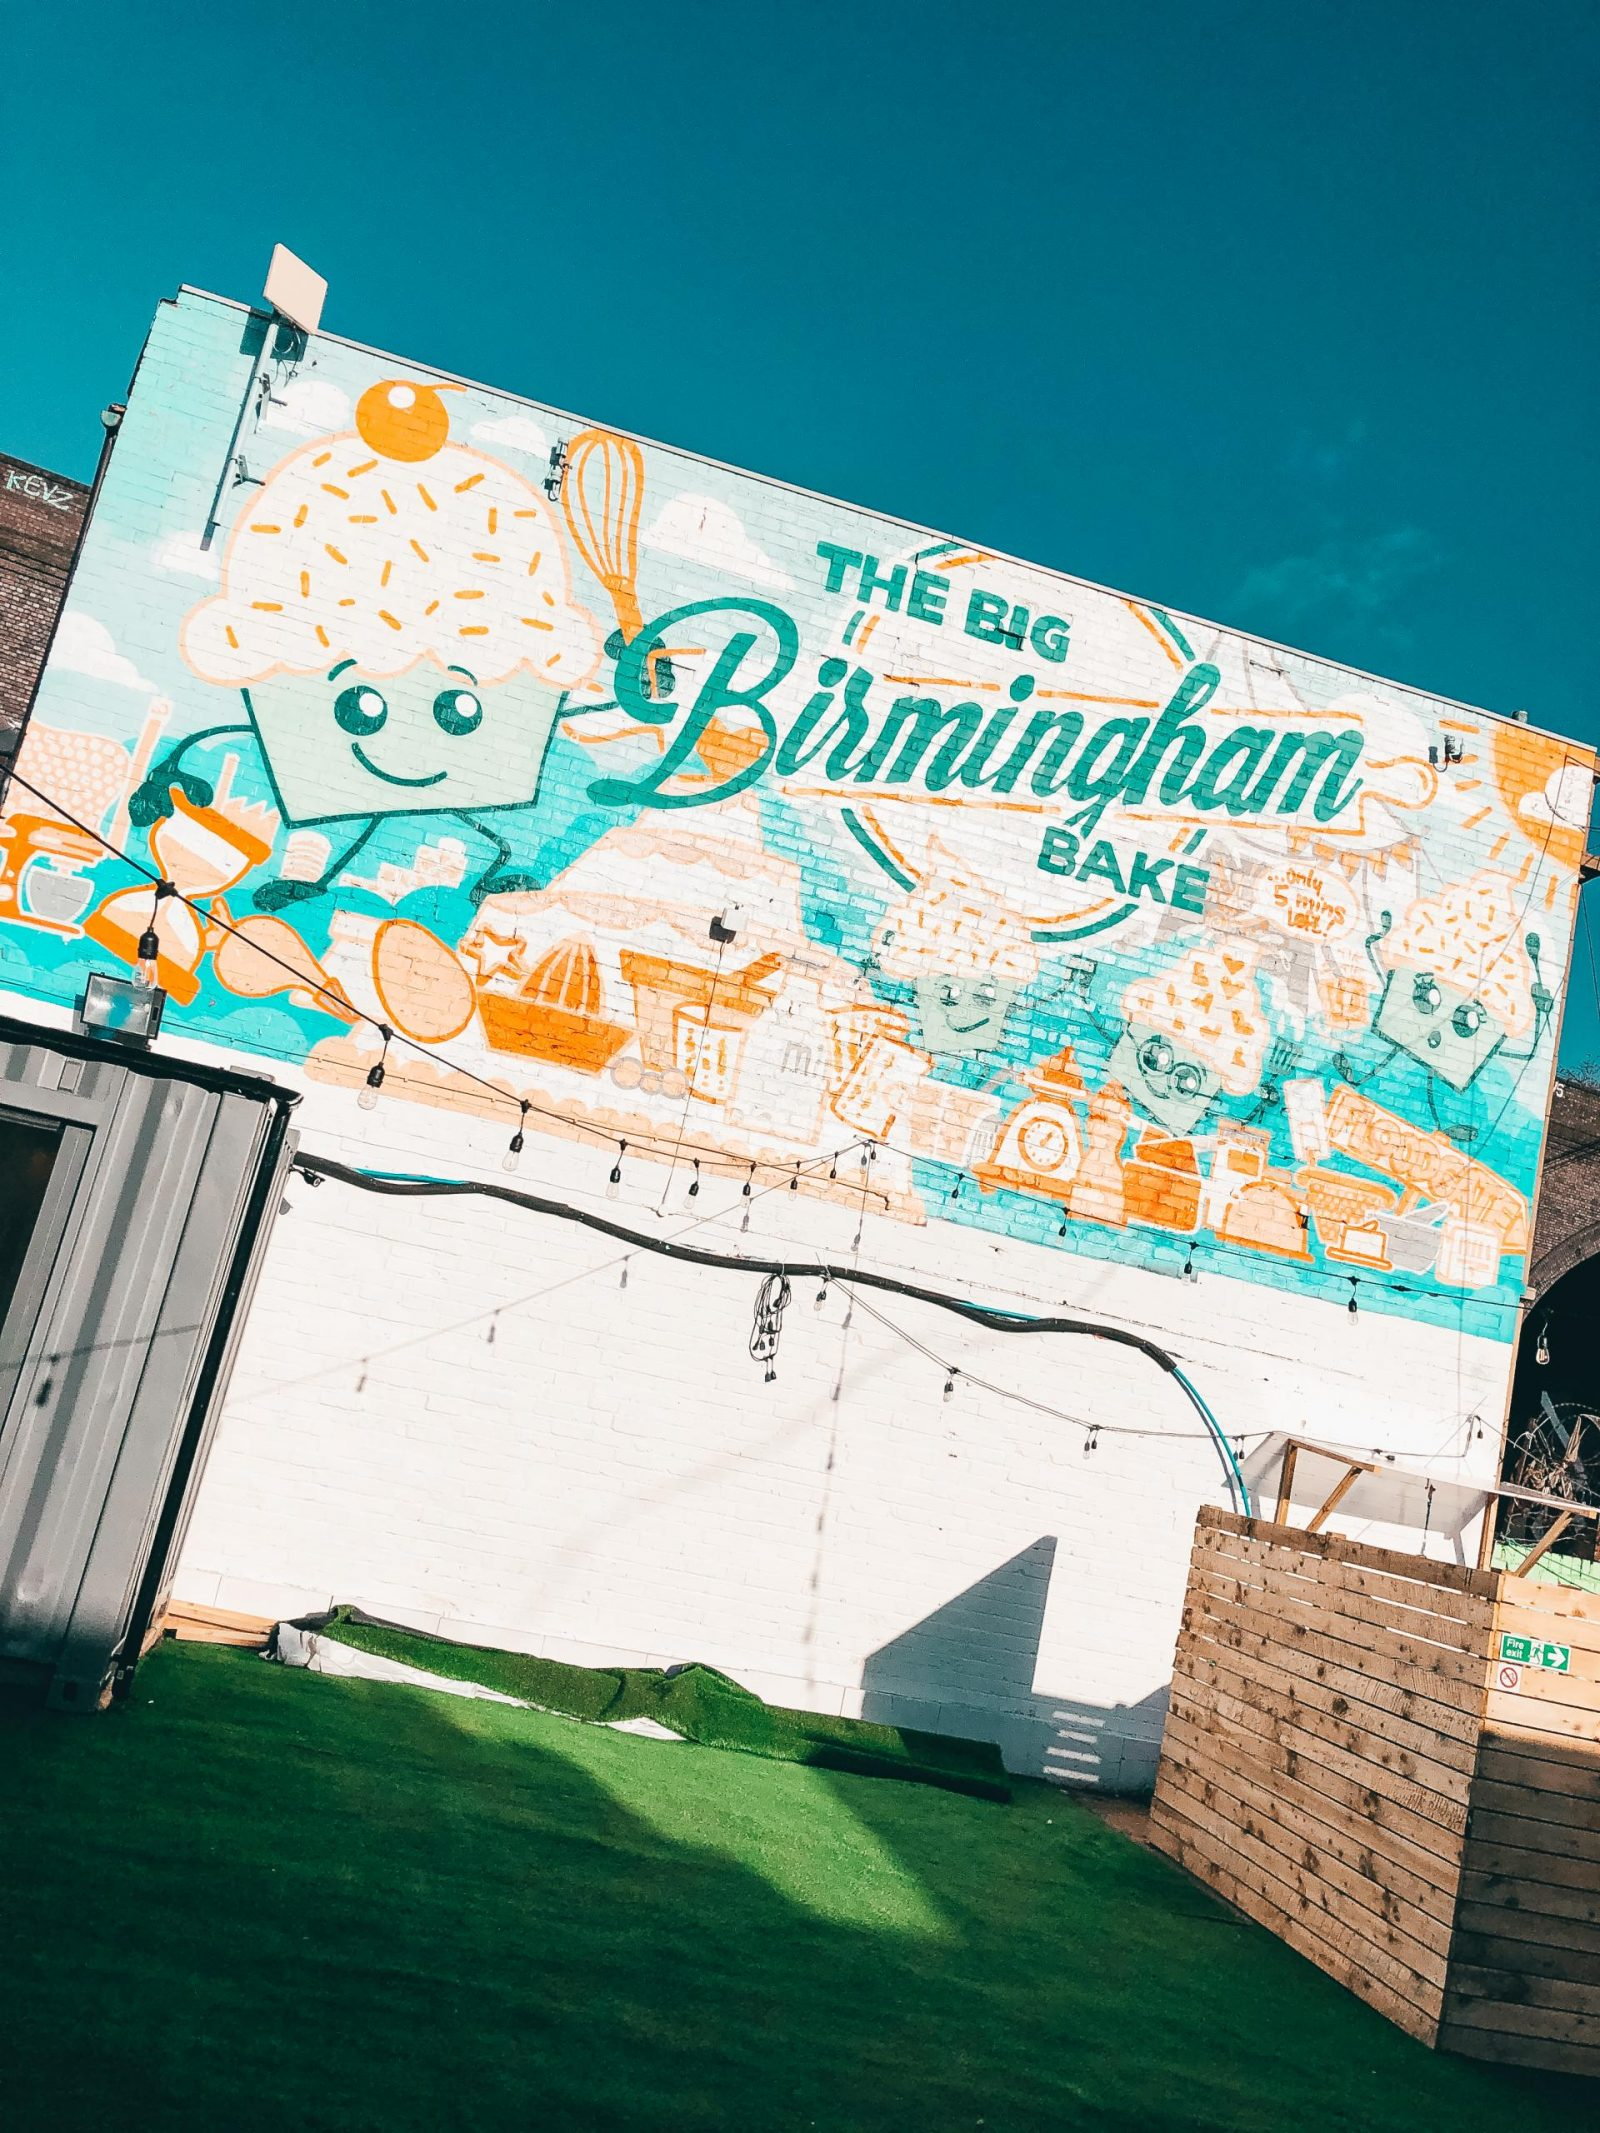 The Big Birmingham Bake